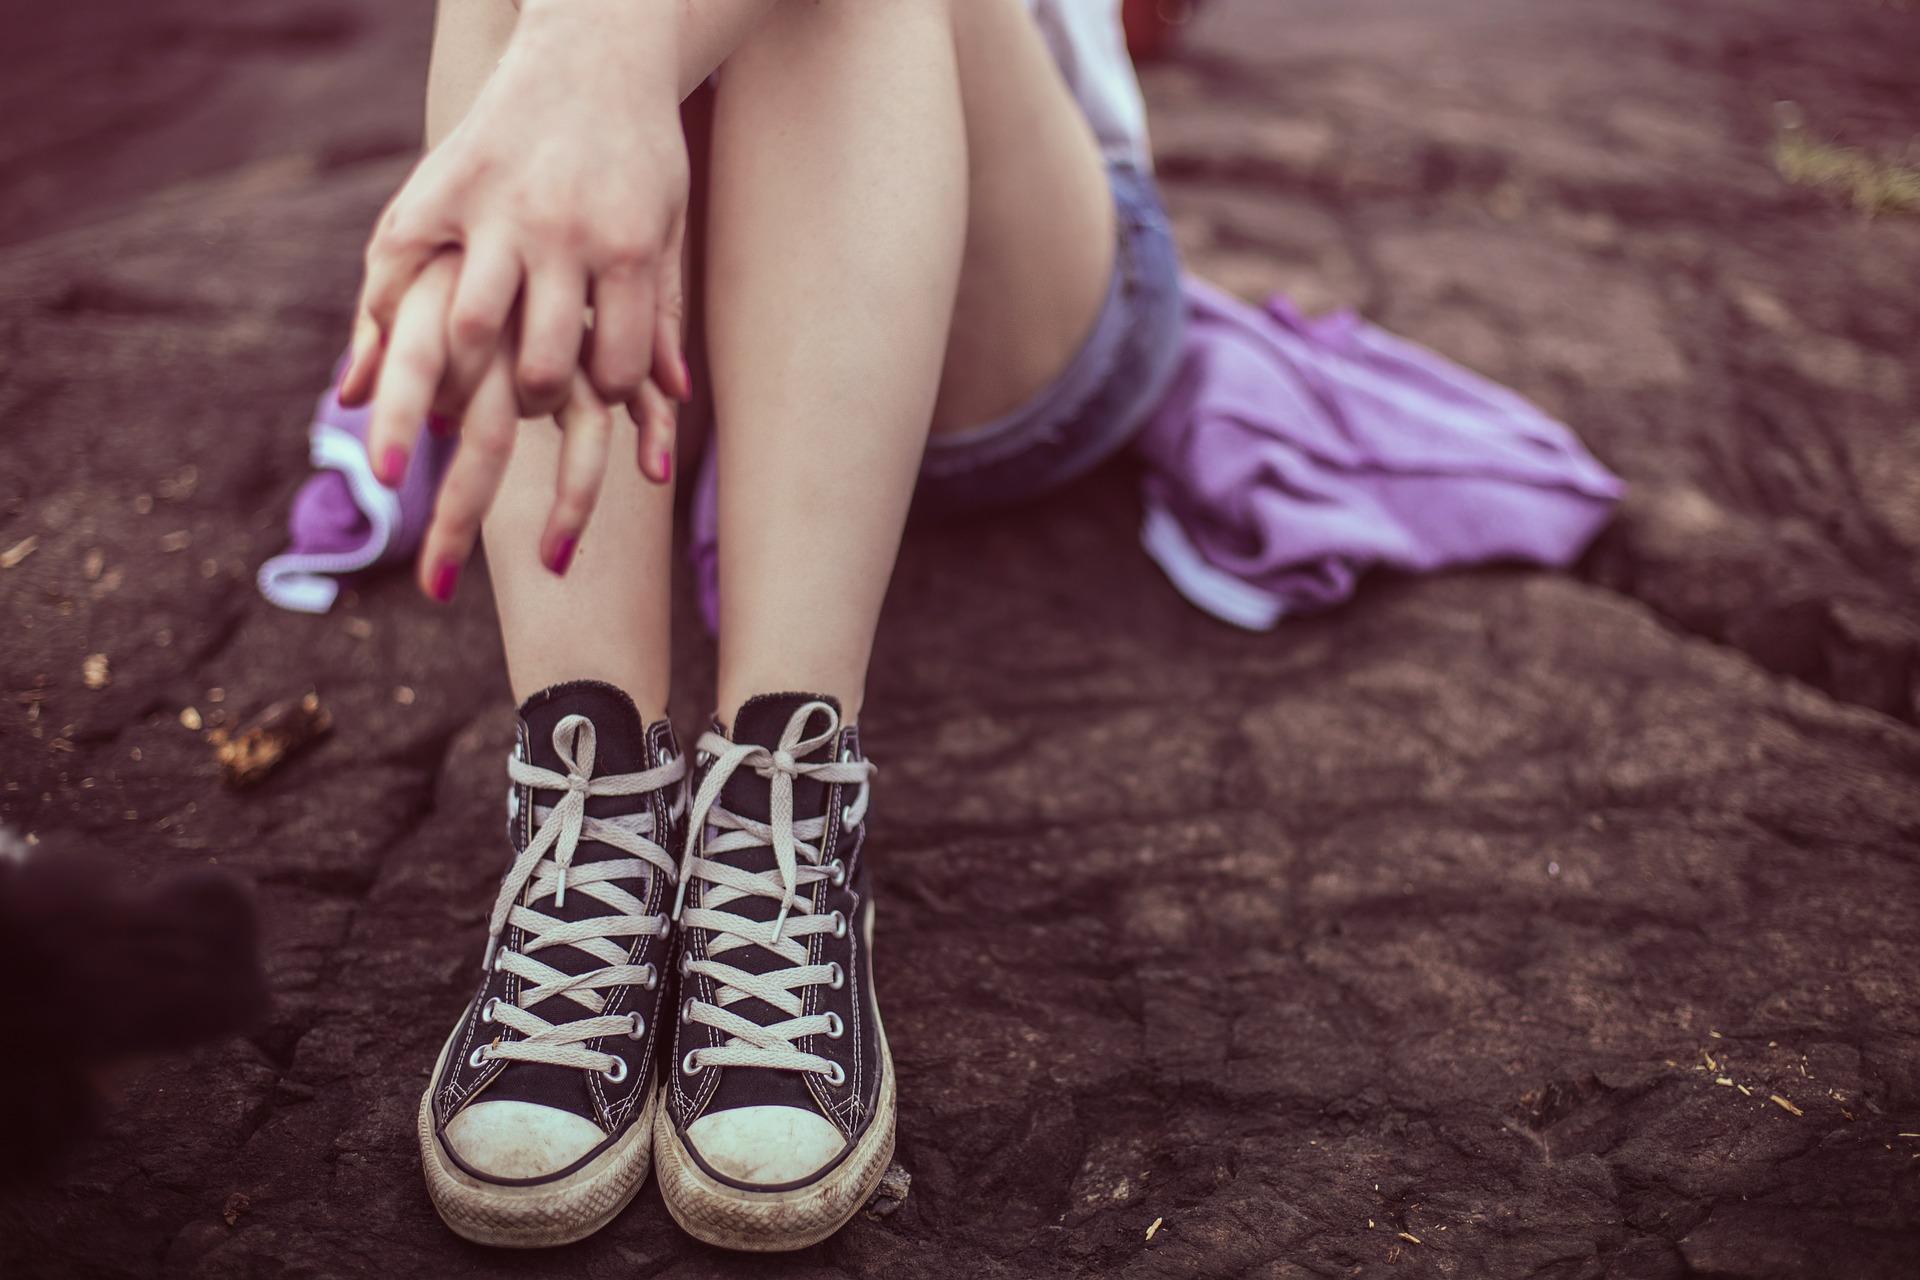 Bien être des adolescents : les comprendre